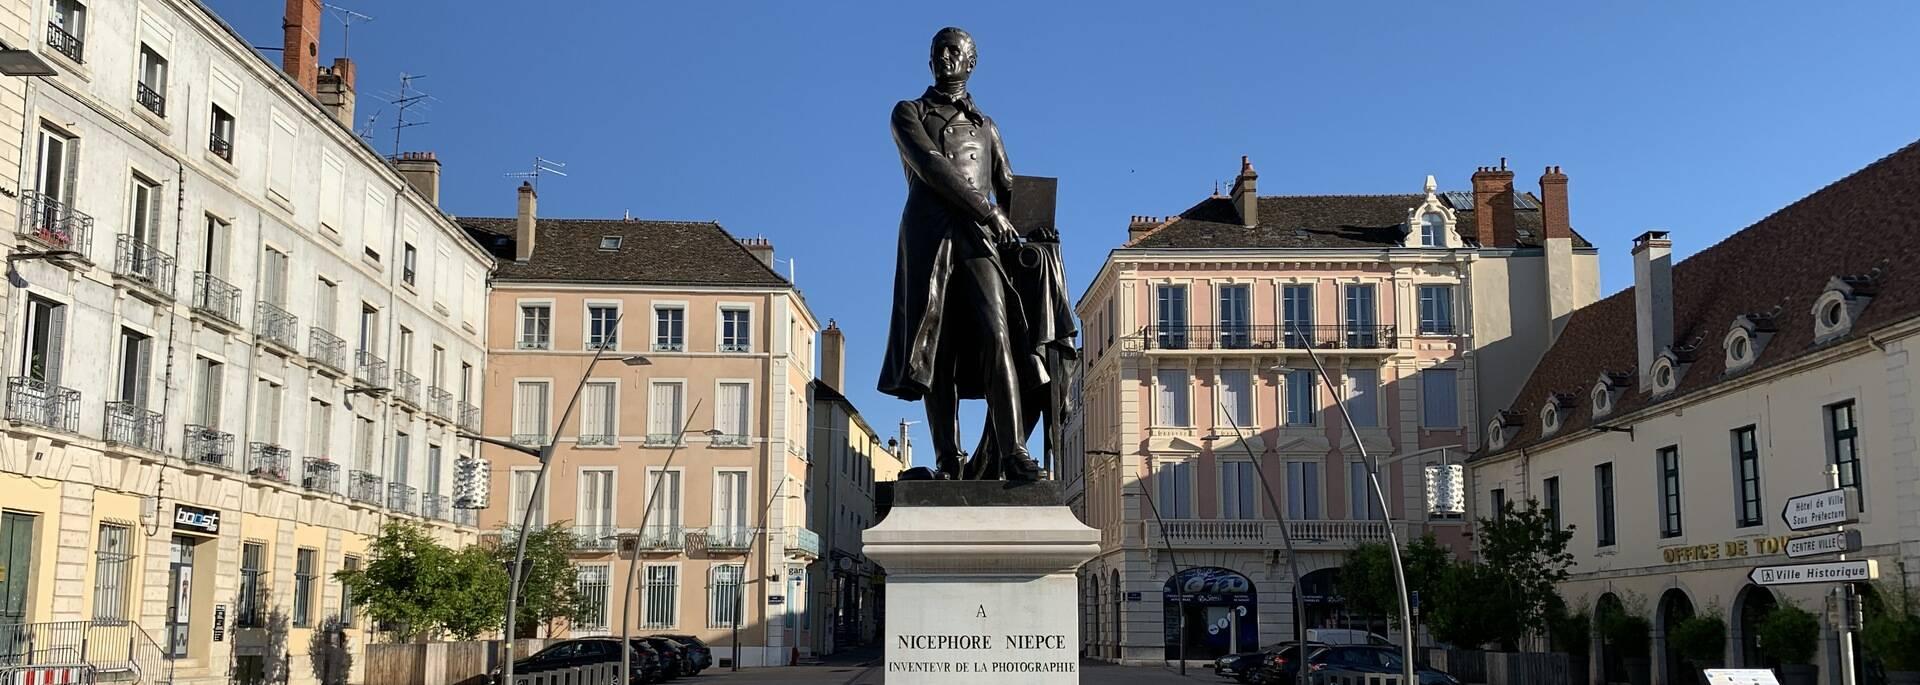 Statue Nicephore Niepce Chalon sur Saone